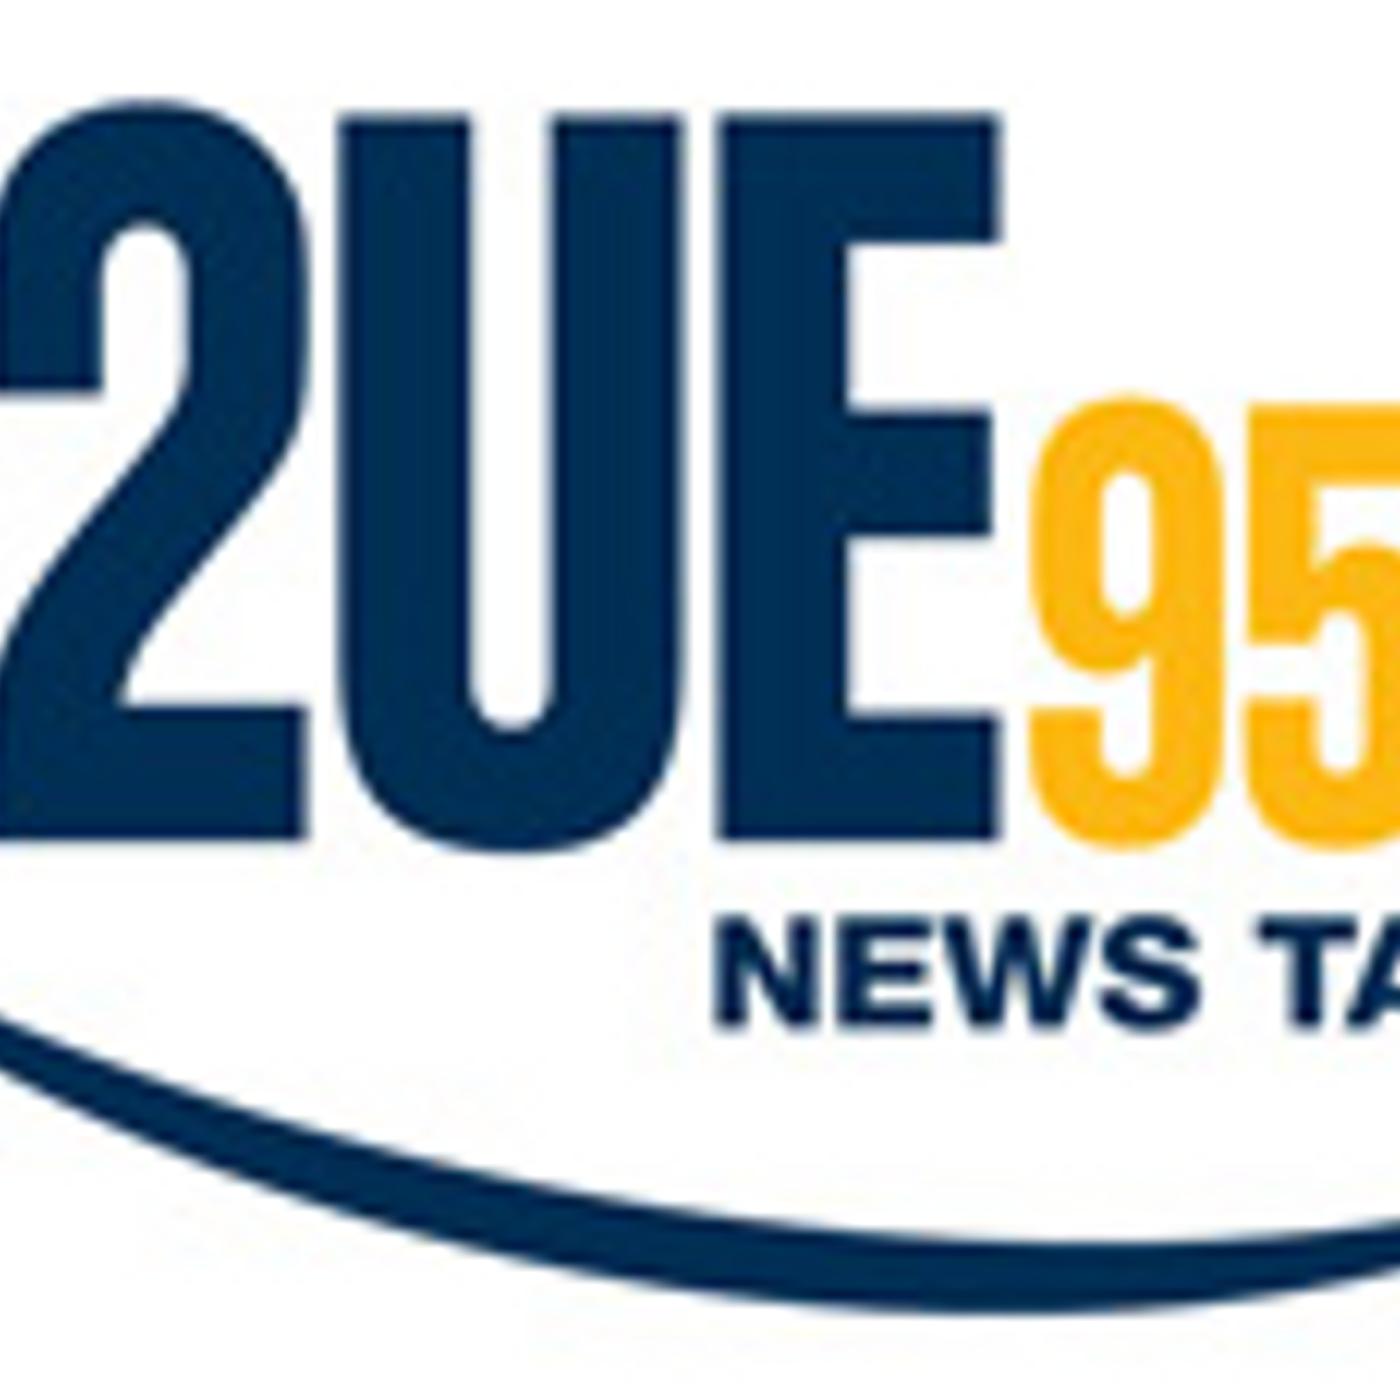 R8wljmrut9qwqdwe7ef5 radio 2ue logo